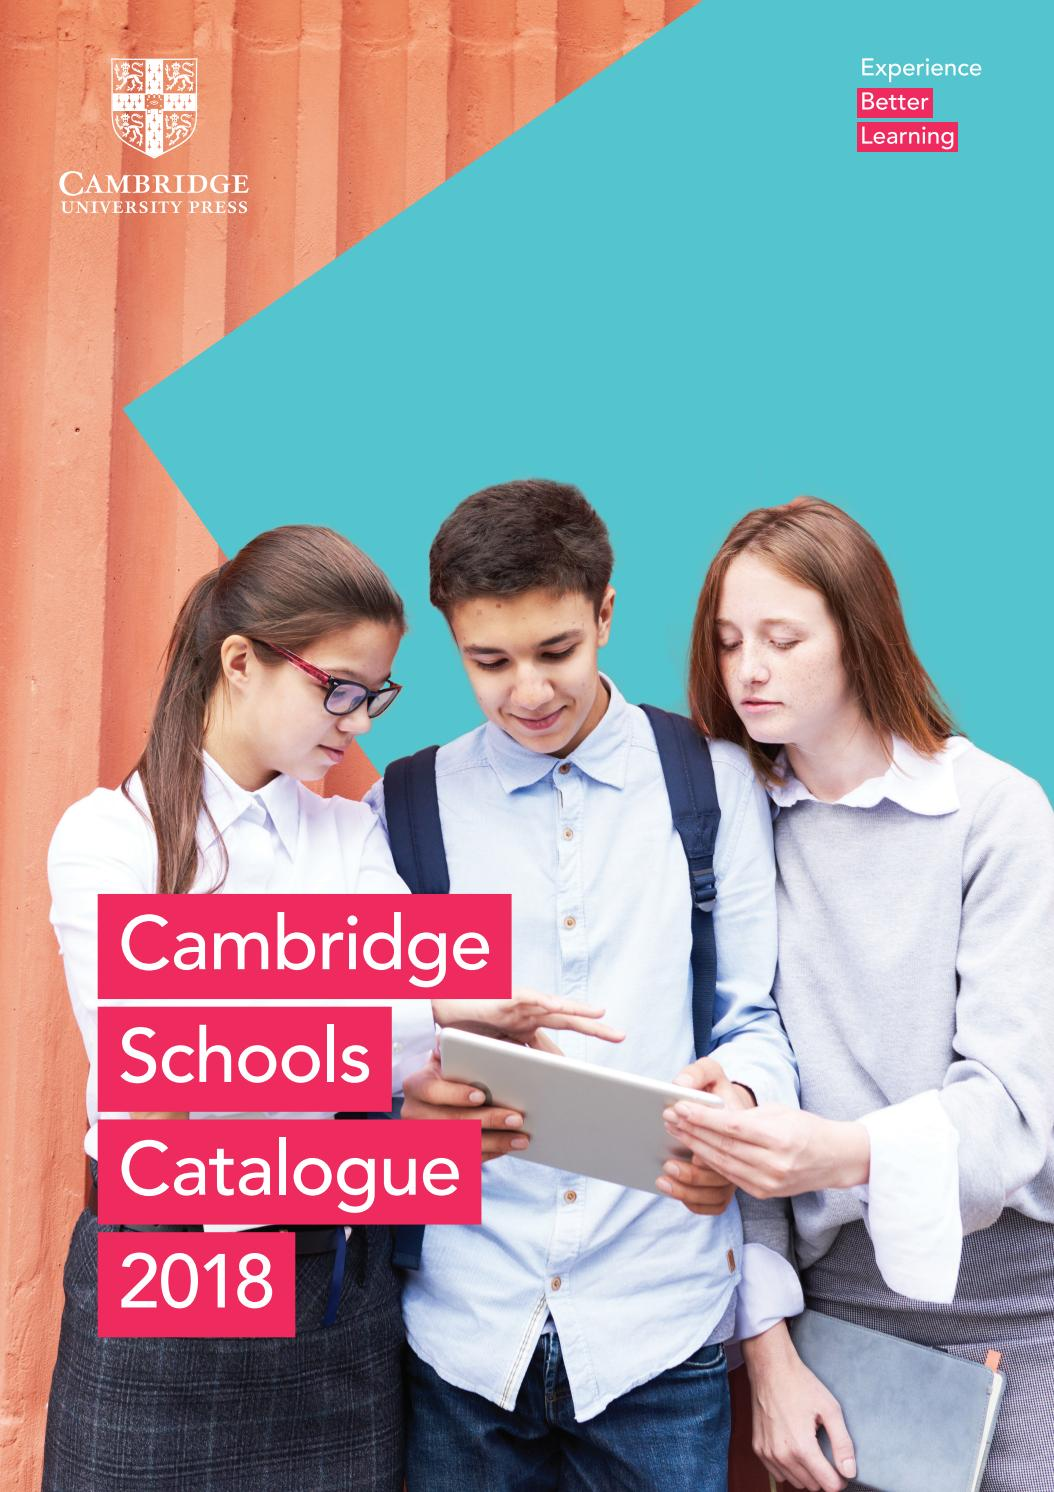 2018 ELT EDU Cambridge University Press Schools Catalogue Turkey by  Cambridge University Press - issuu